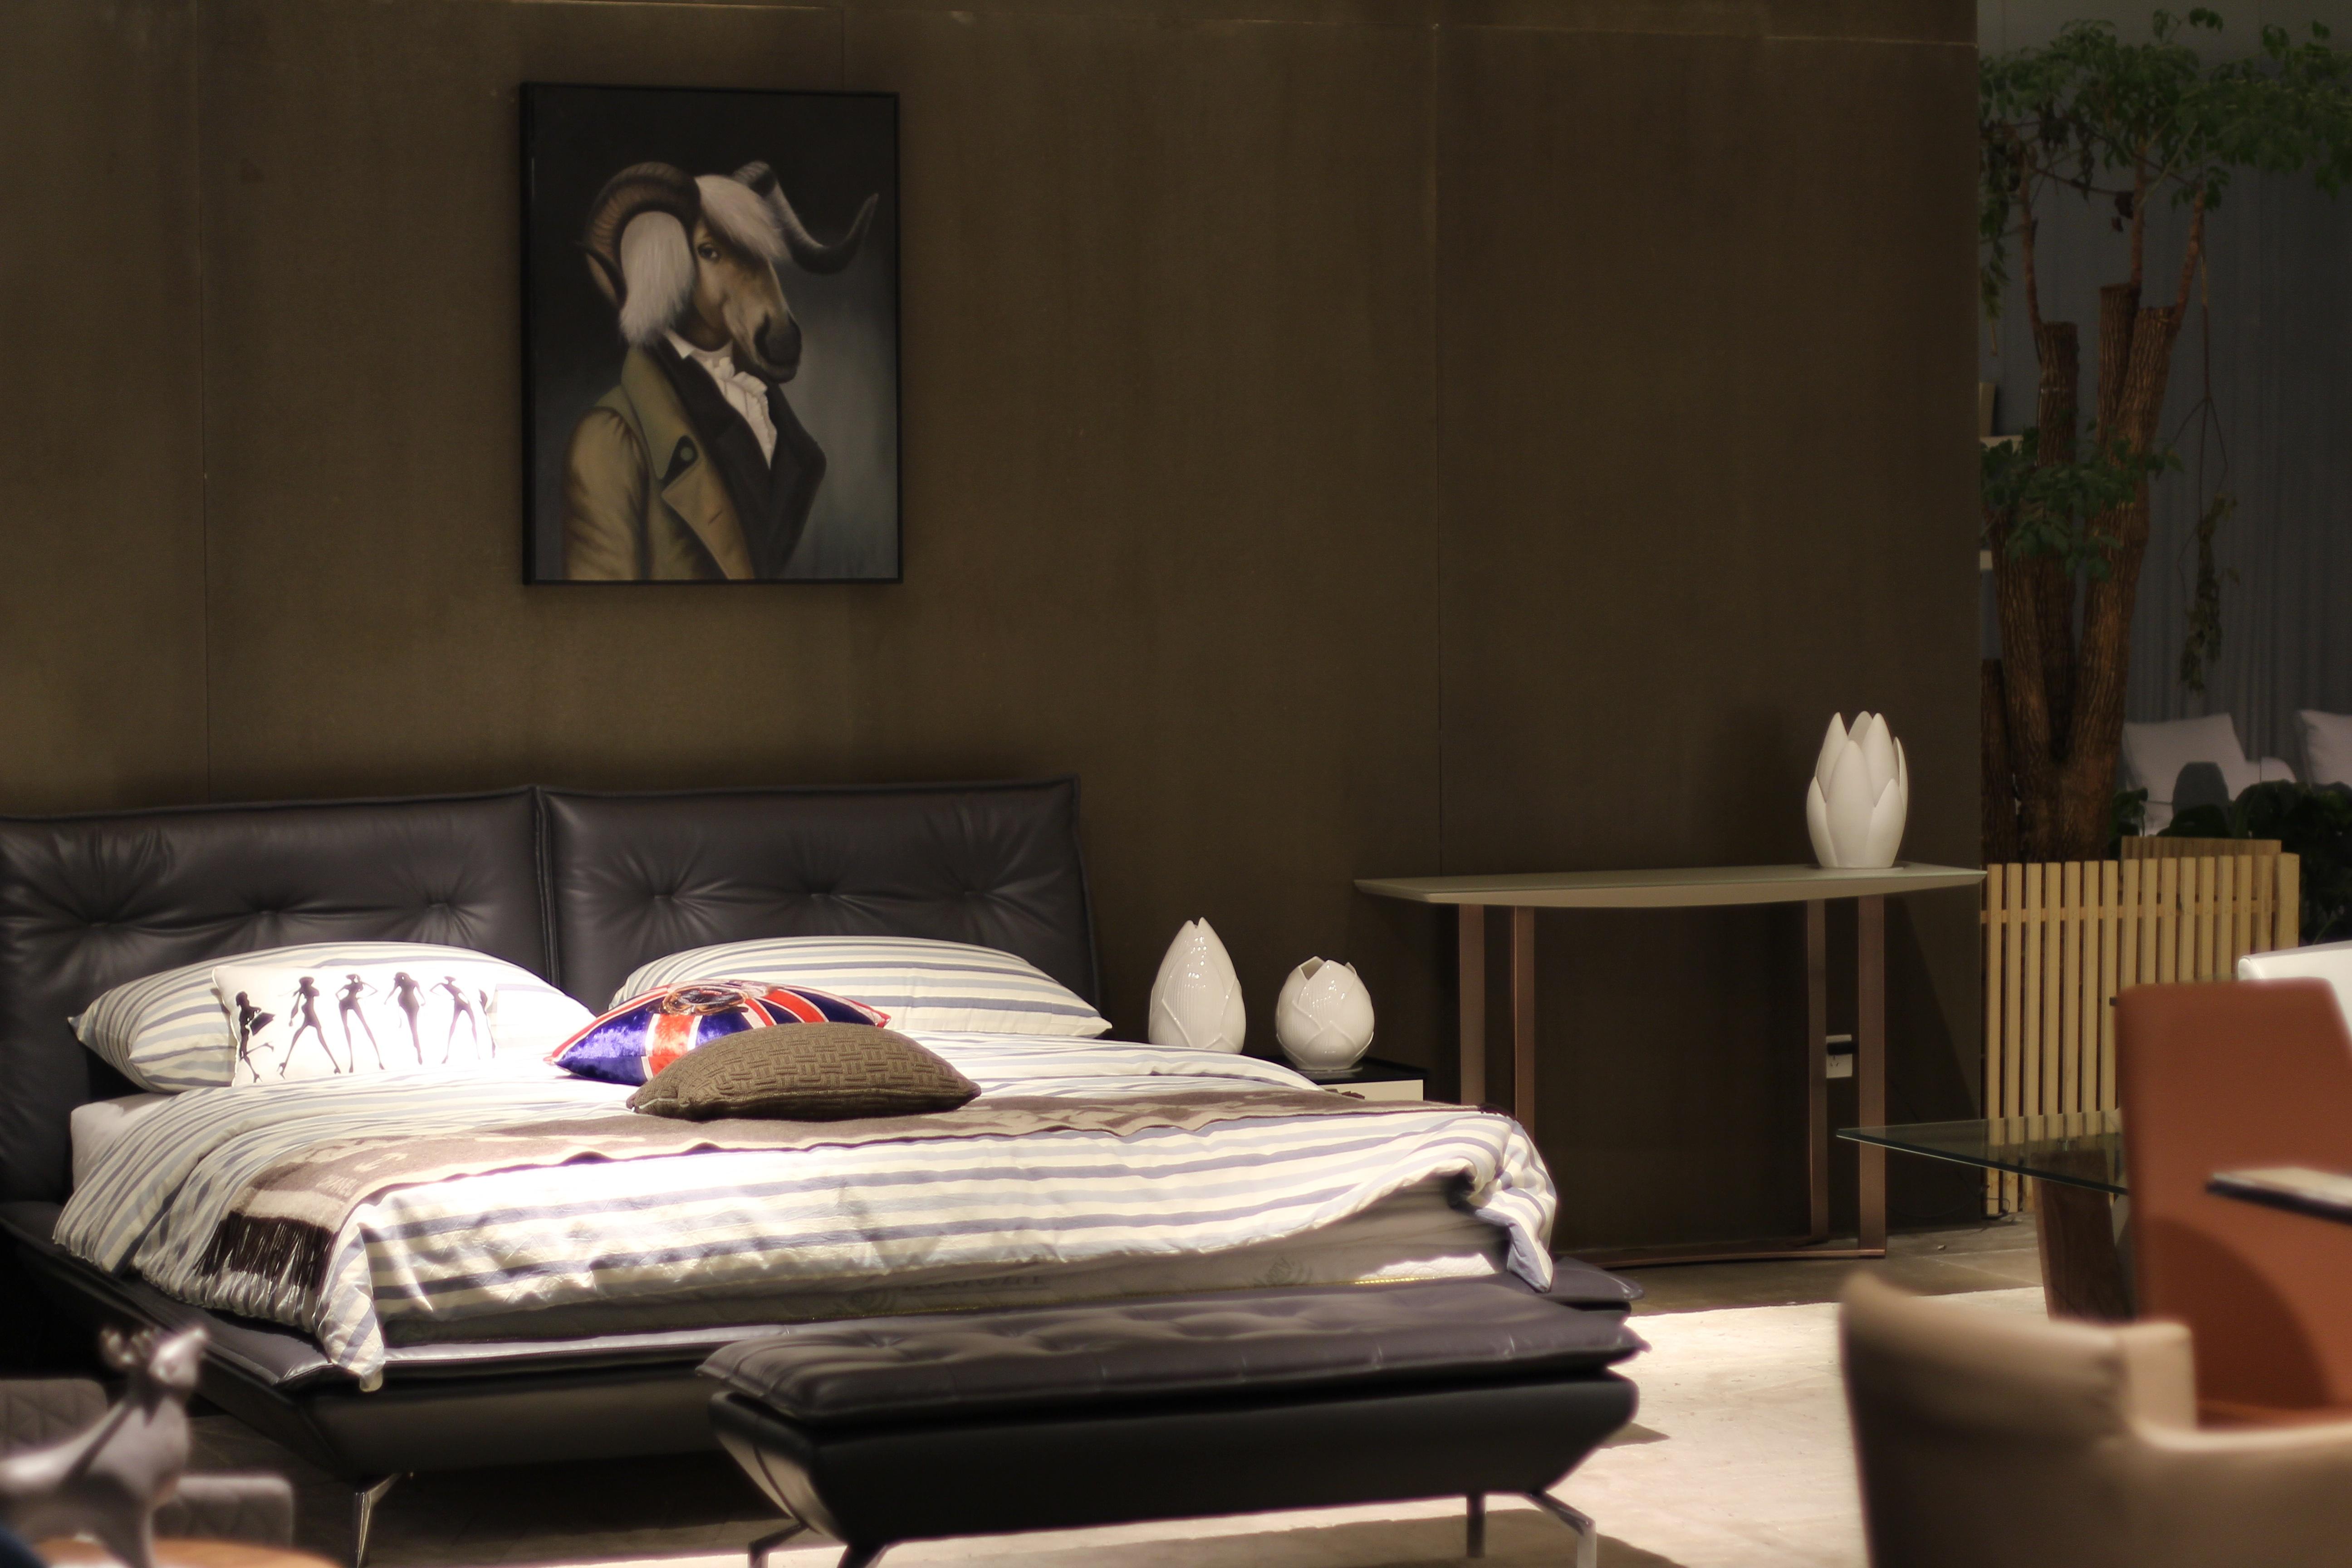 Bed In Woonkamer : Zitbank bed en chaise longue in één